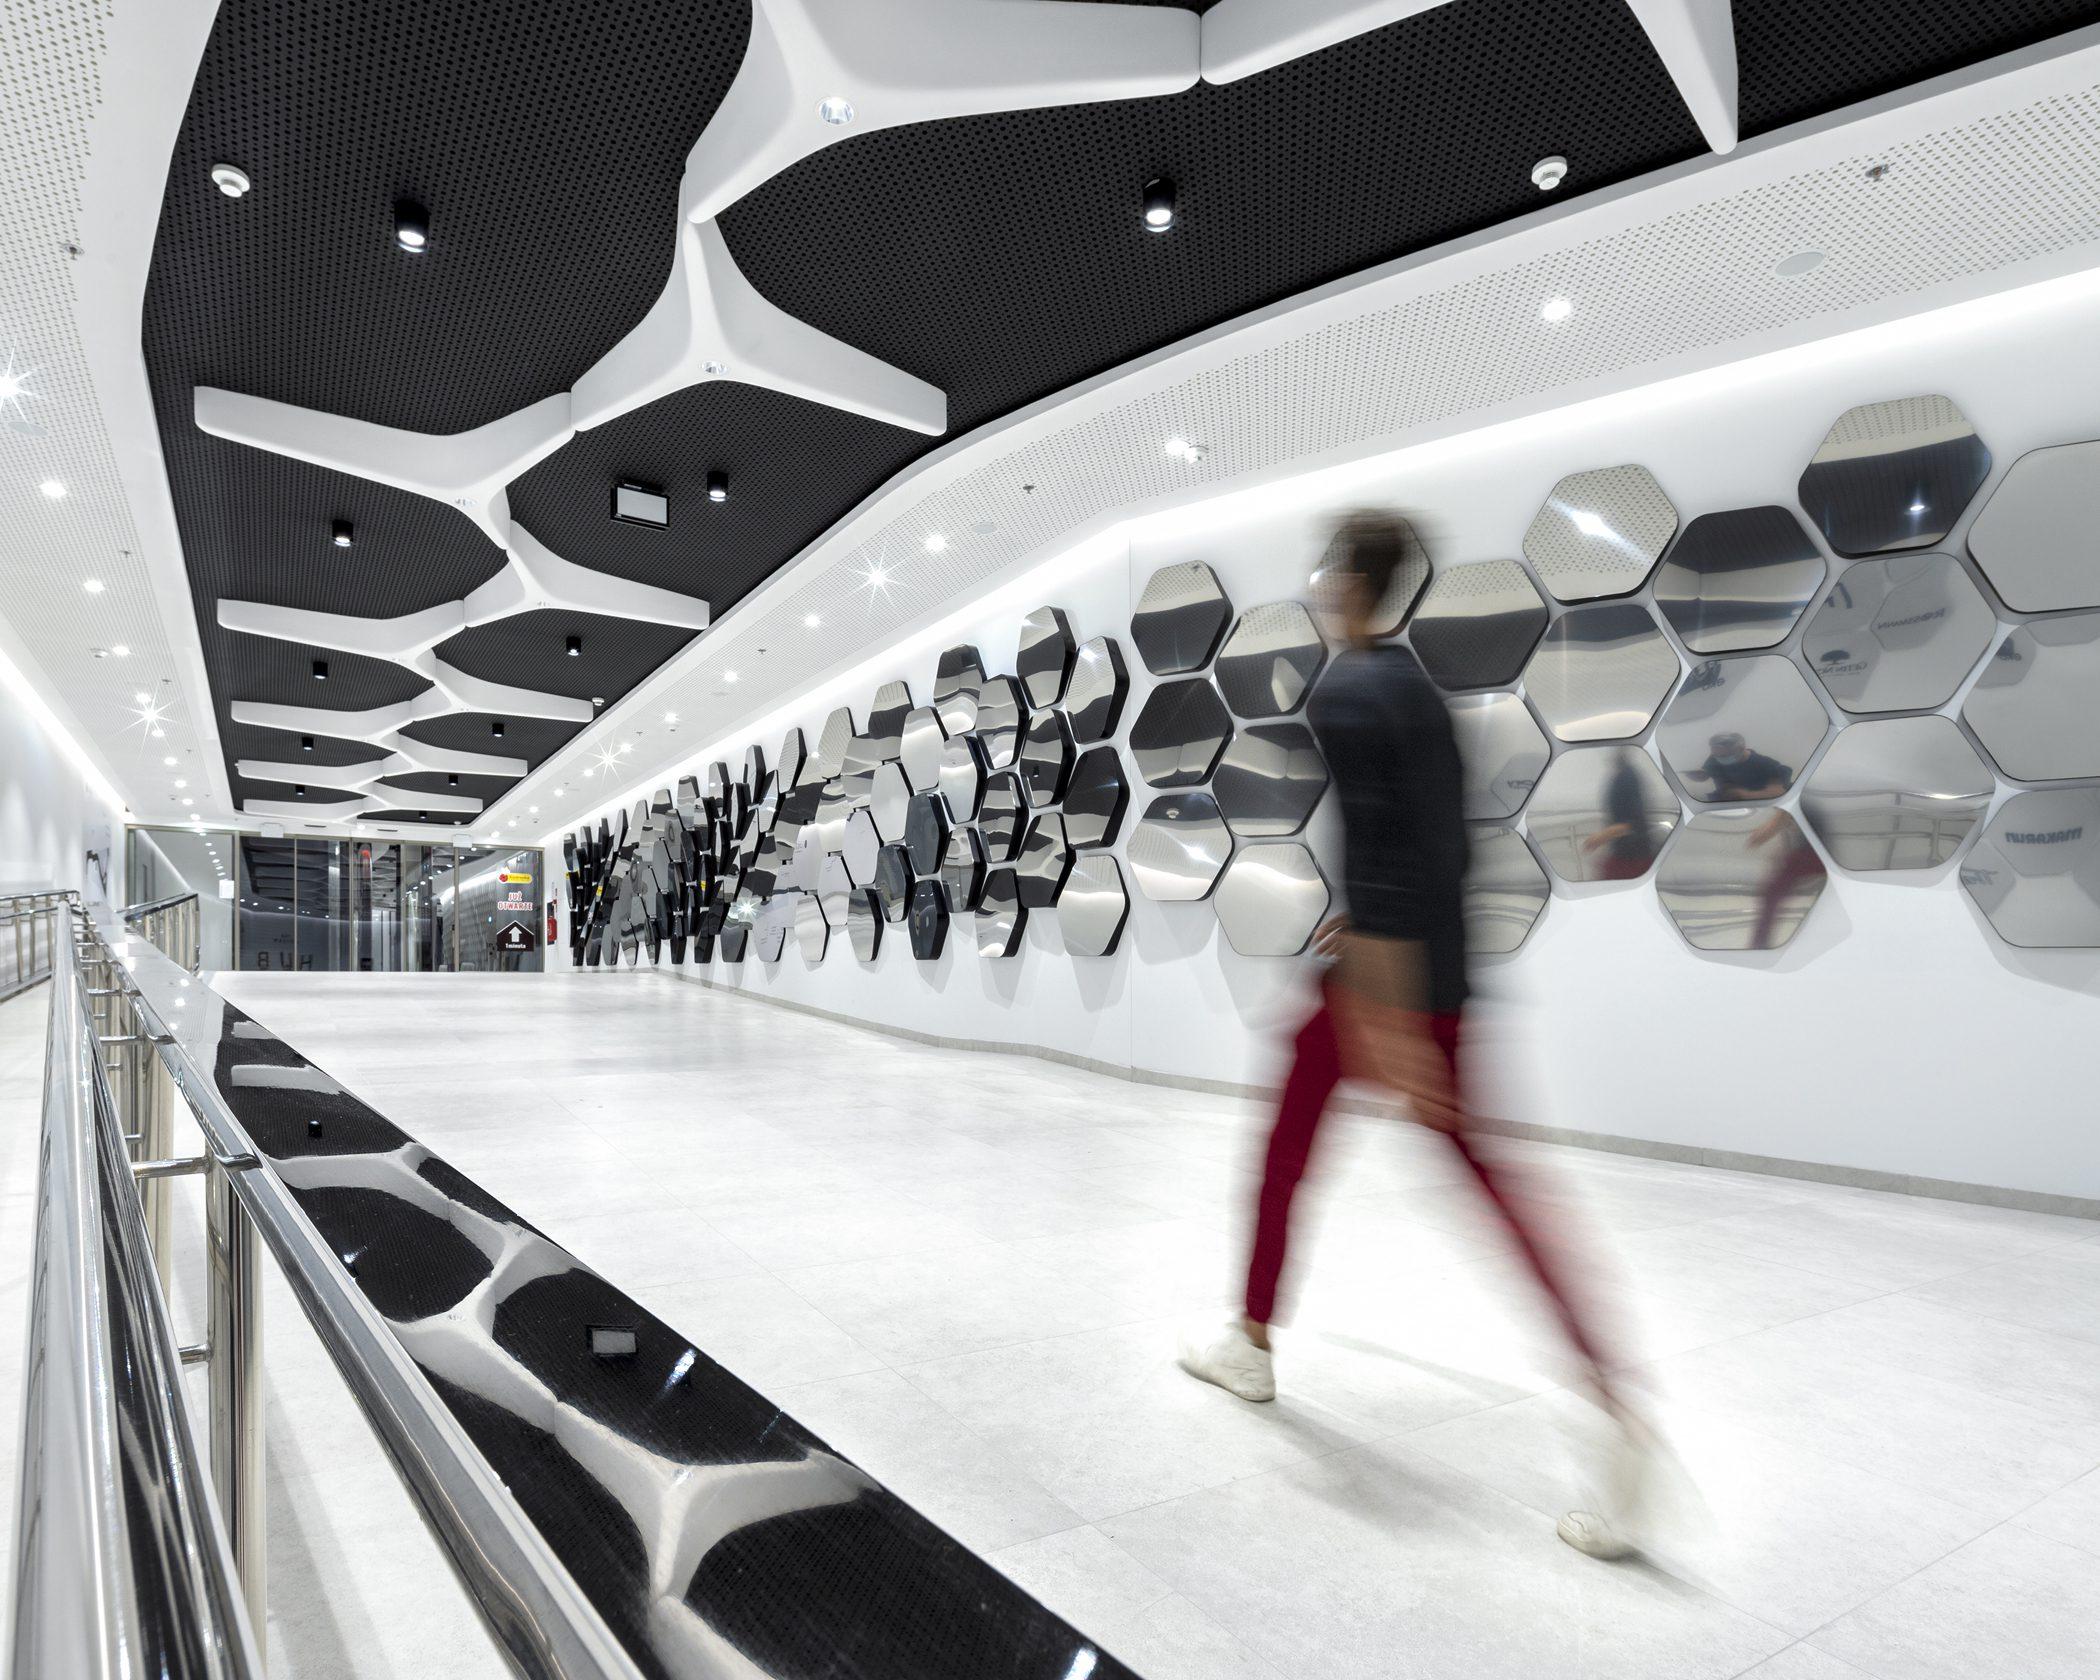 Hub Shopping Center